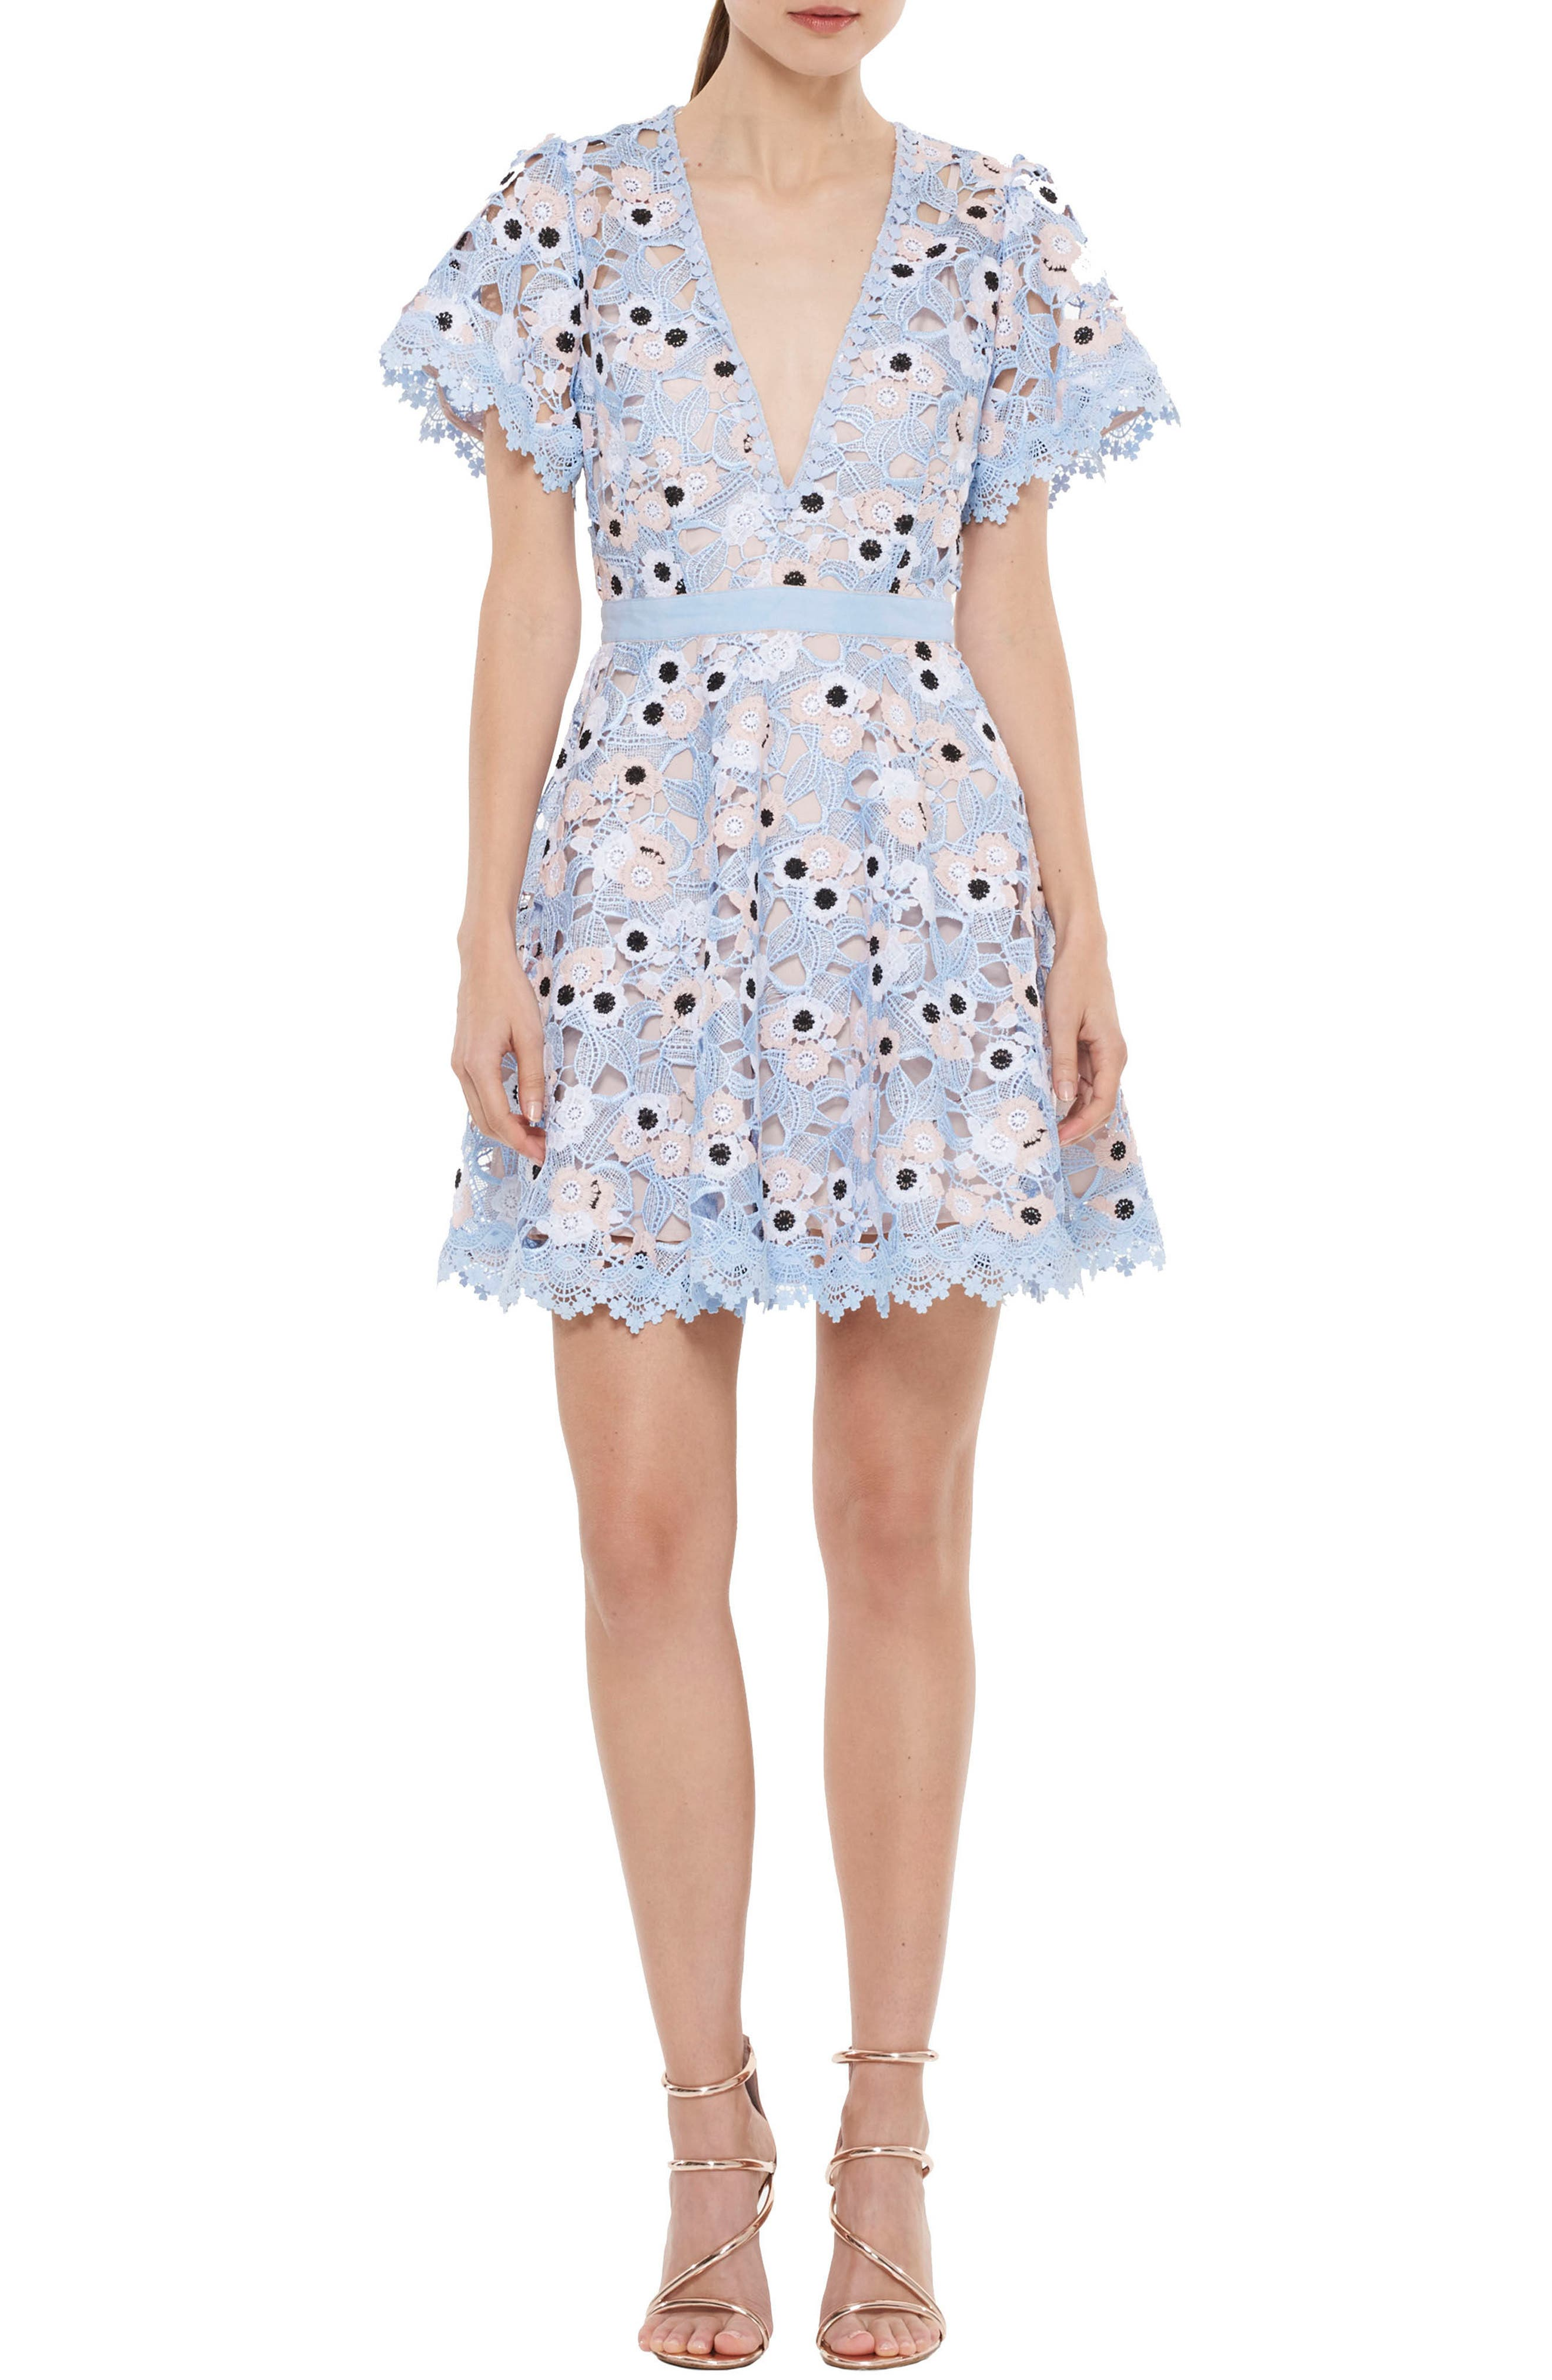 Infatuation Crochet Dress,                             Main thumbnail 1, color,                             450